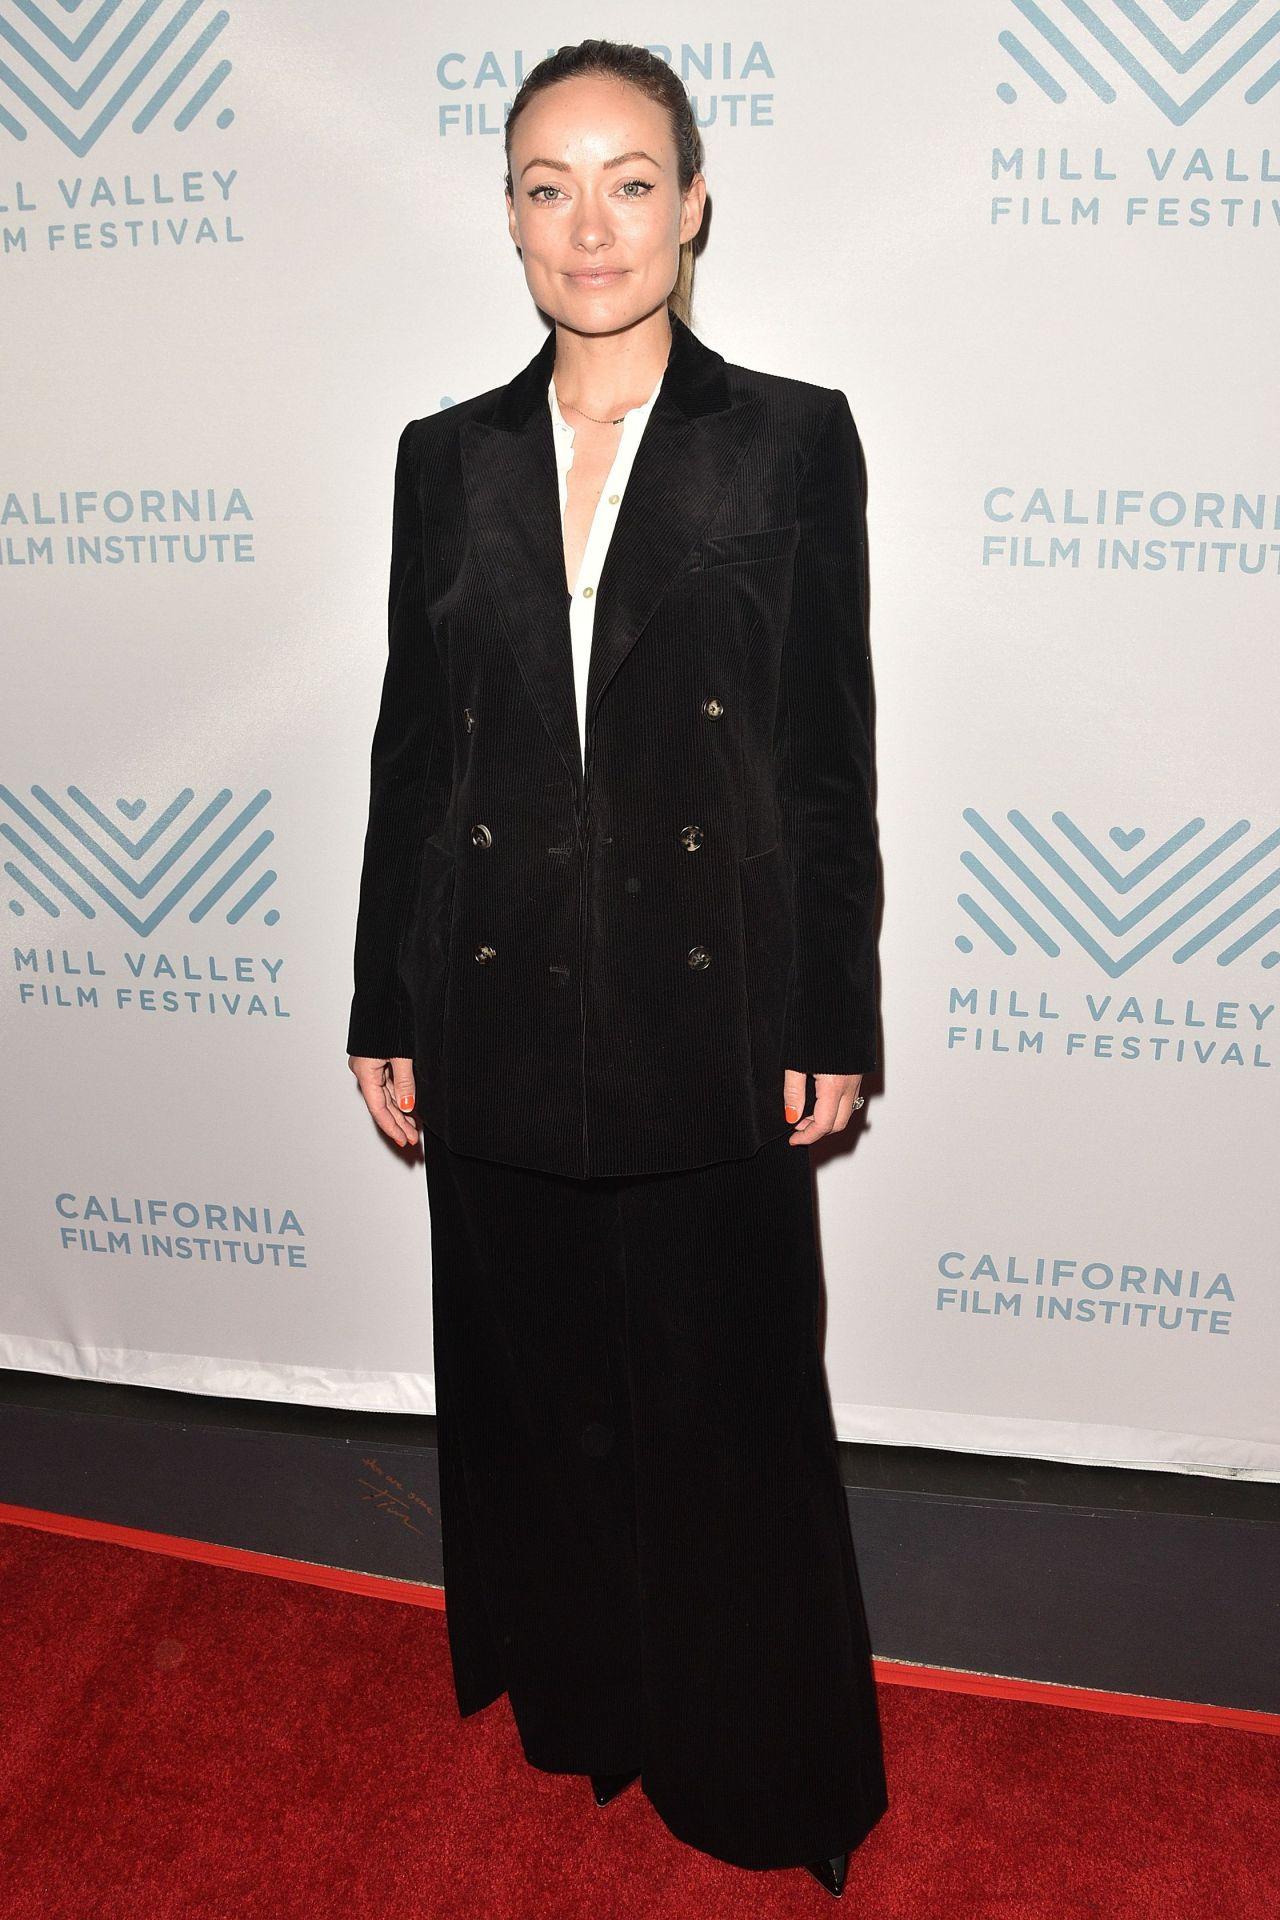 olivia-wilde-in-bella-freud-@-2019-mill-valley-film-festival